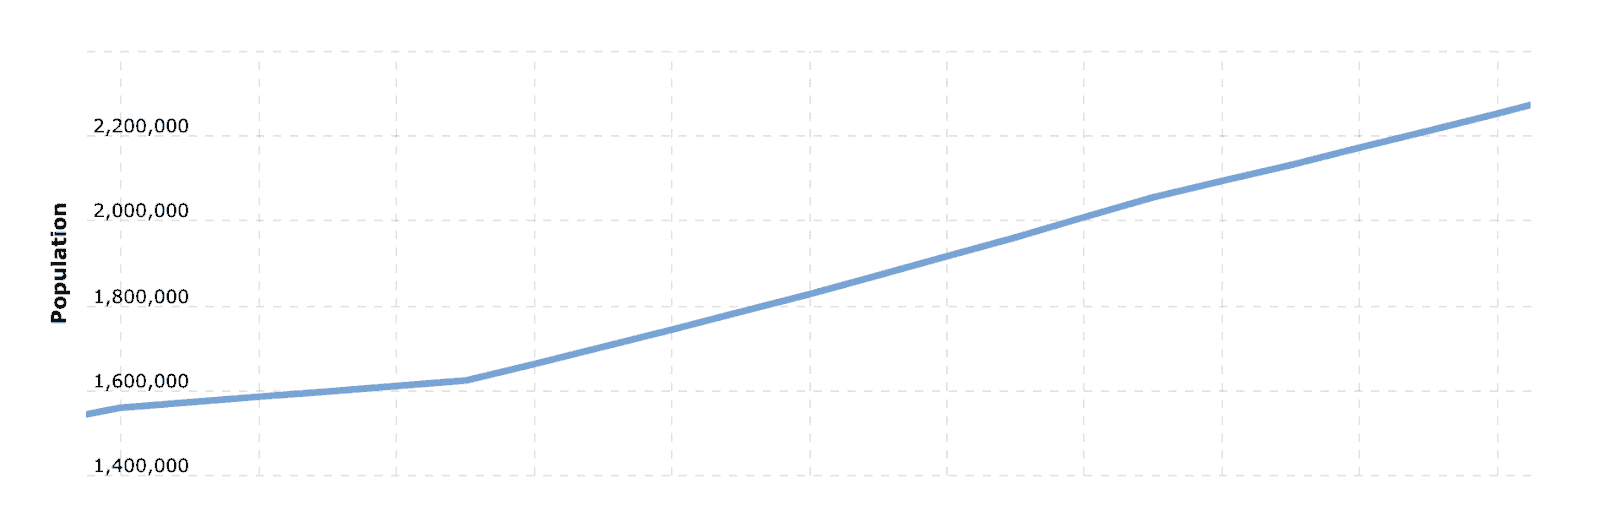 Brisbane demographics